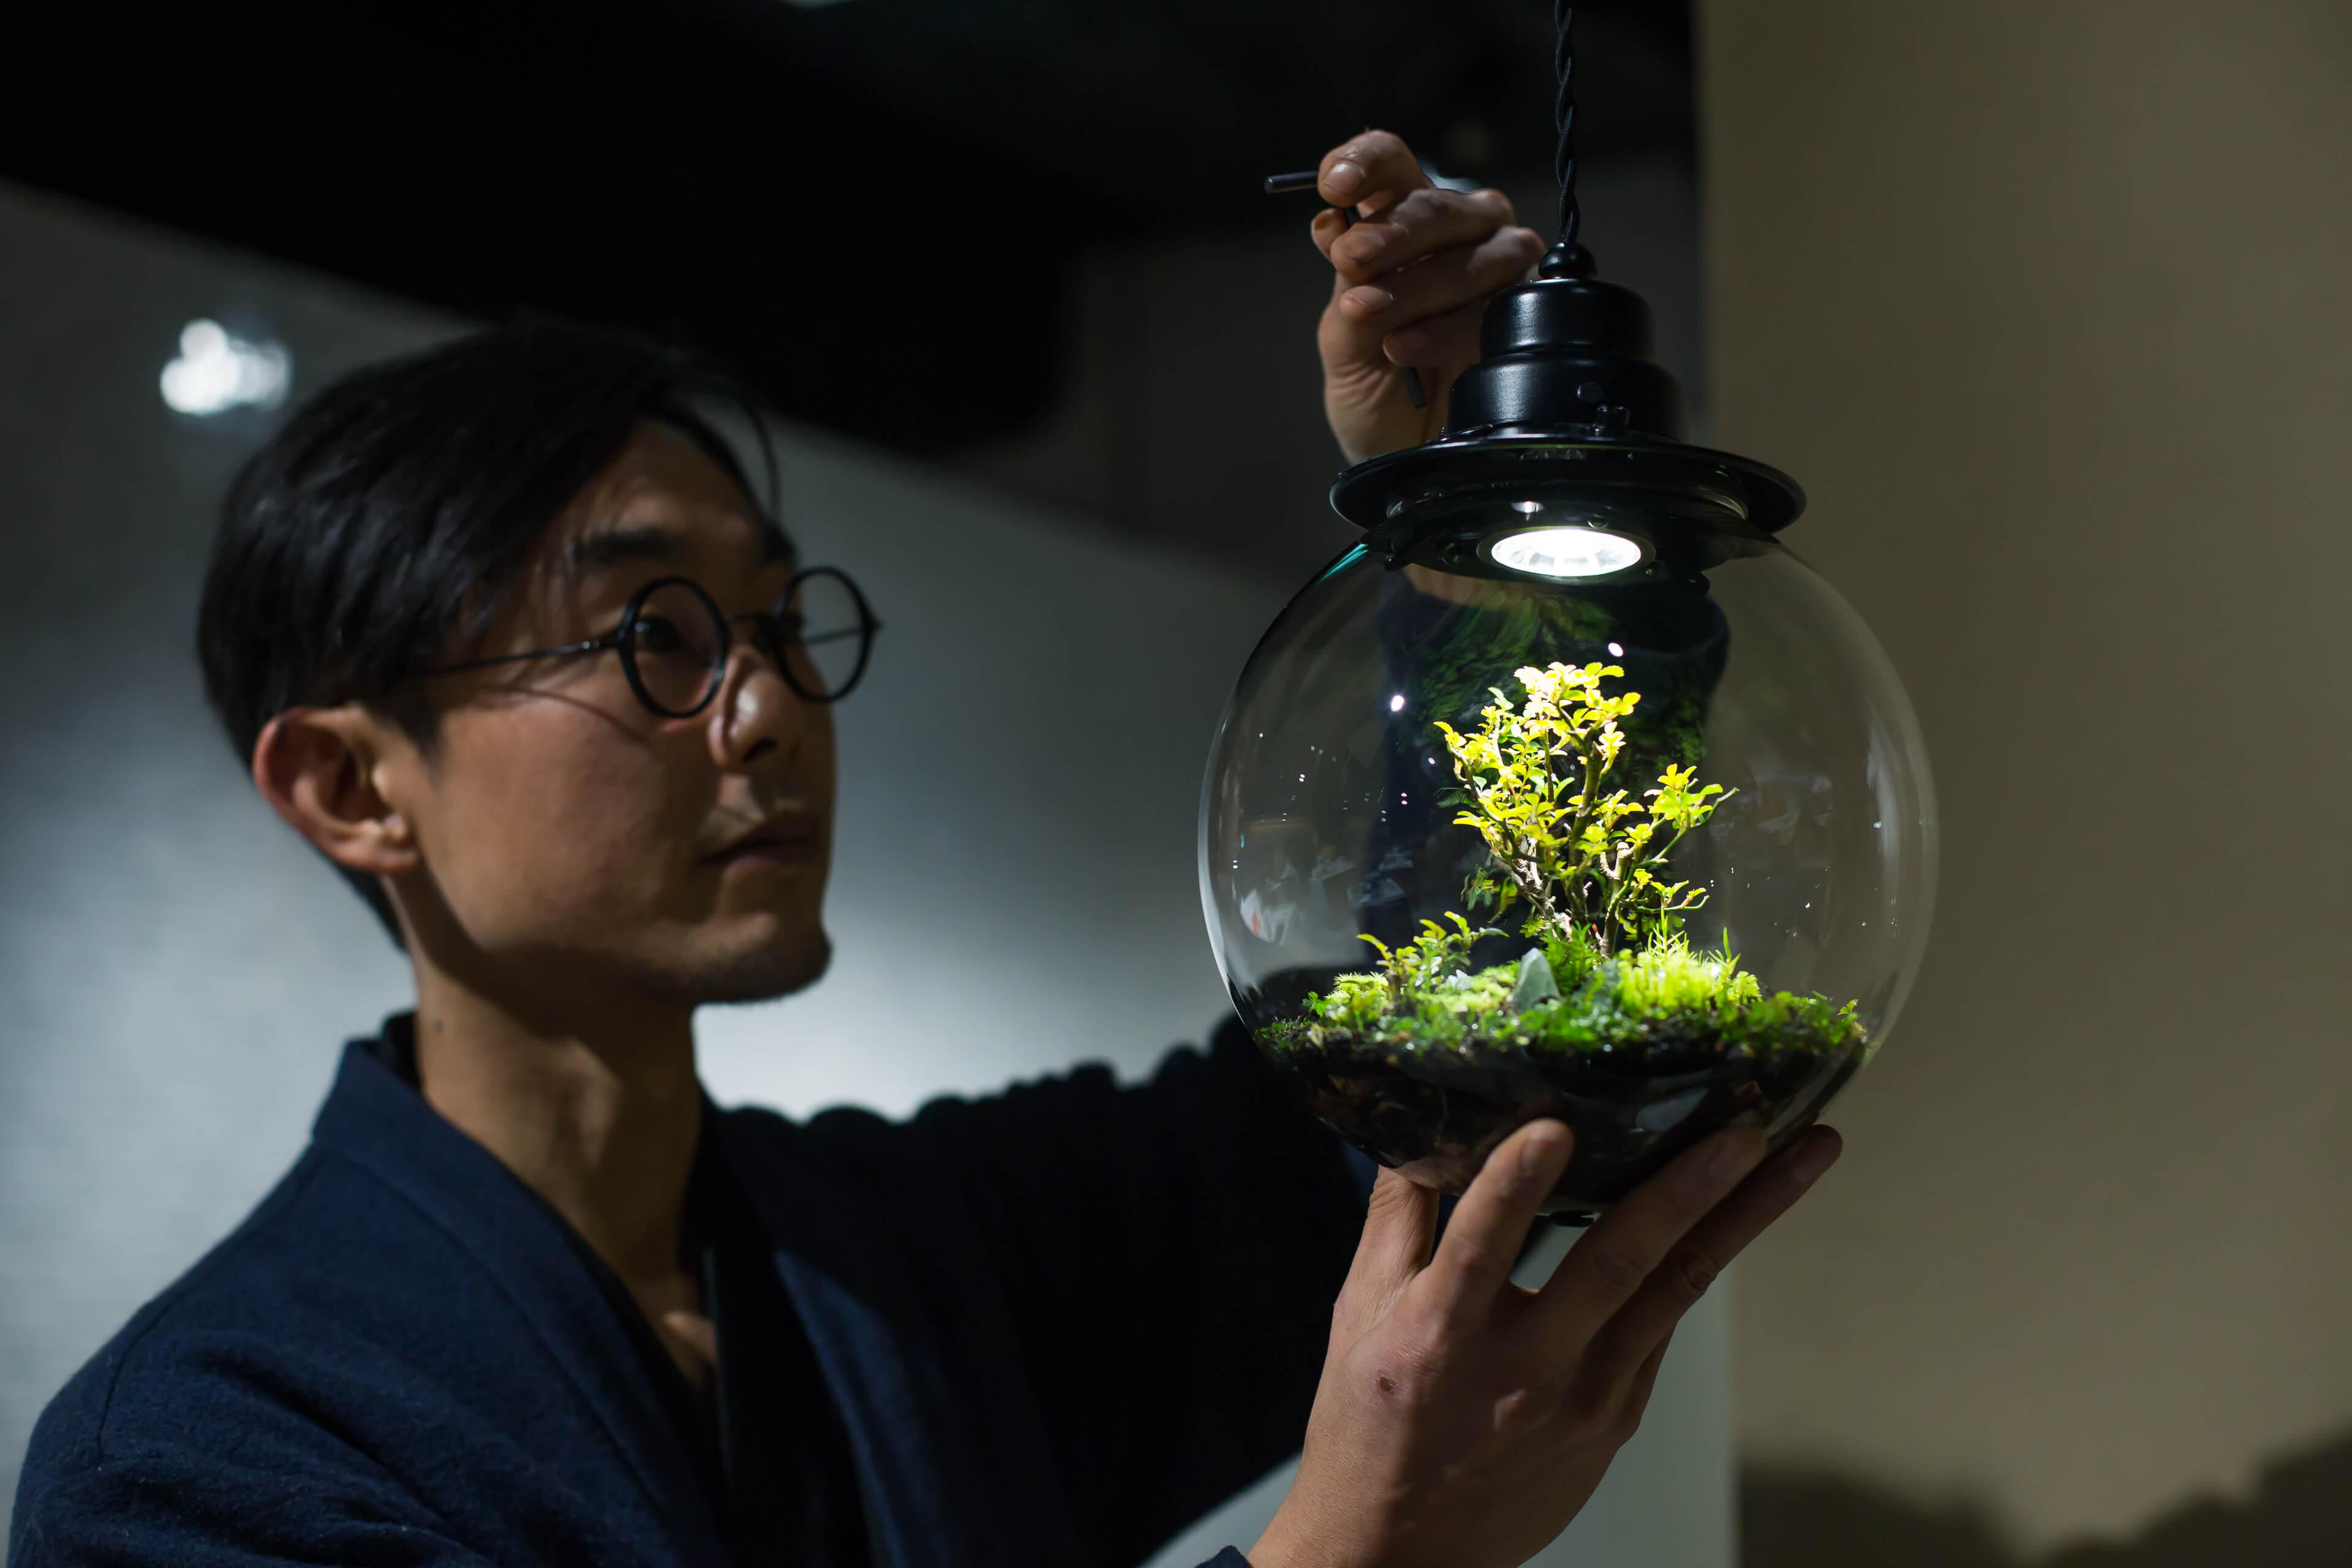 Re:Planter・村瀬貴昭さんが提案する  植物を介したコミュニケーションの形